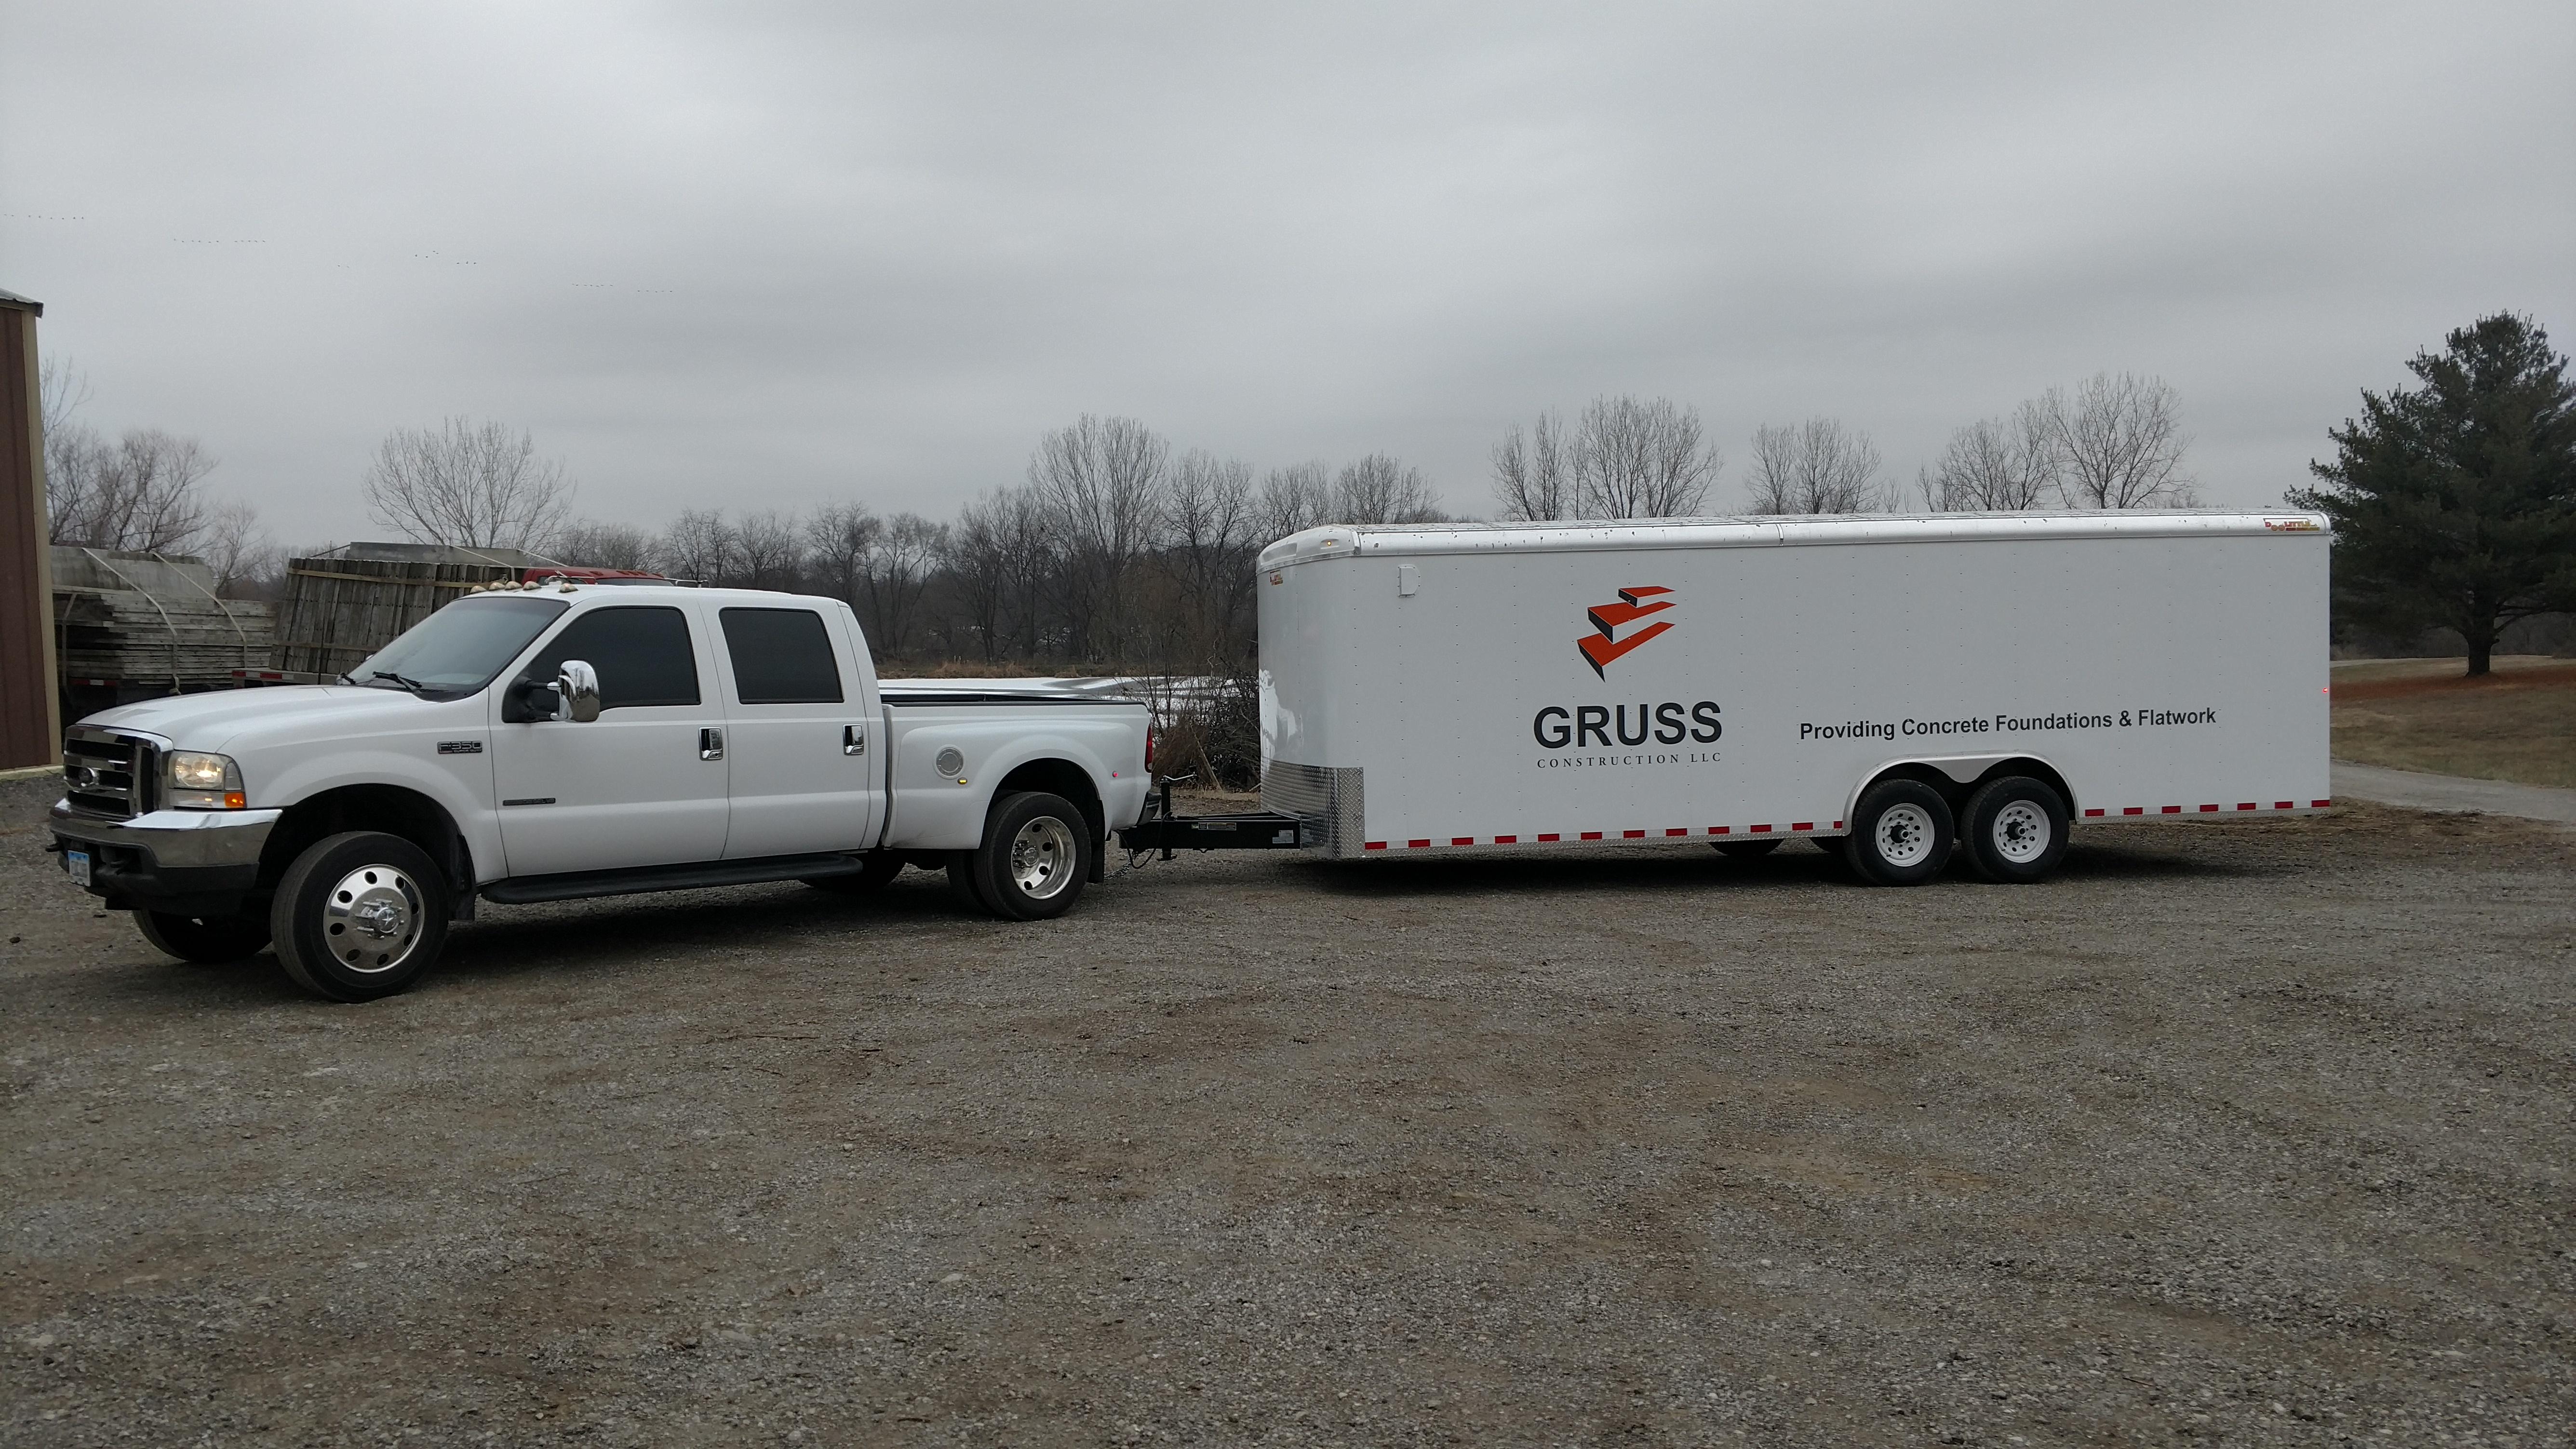 Gruss Construction Truck and Trailer